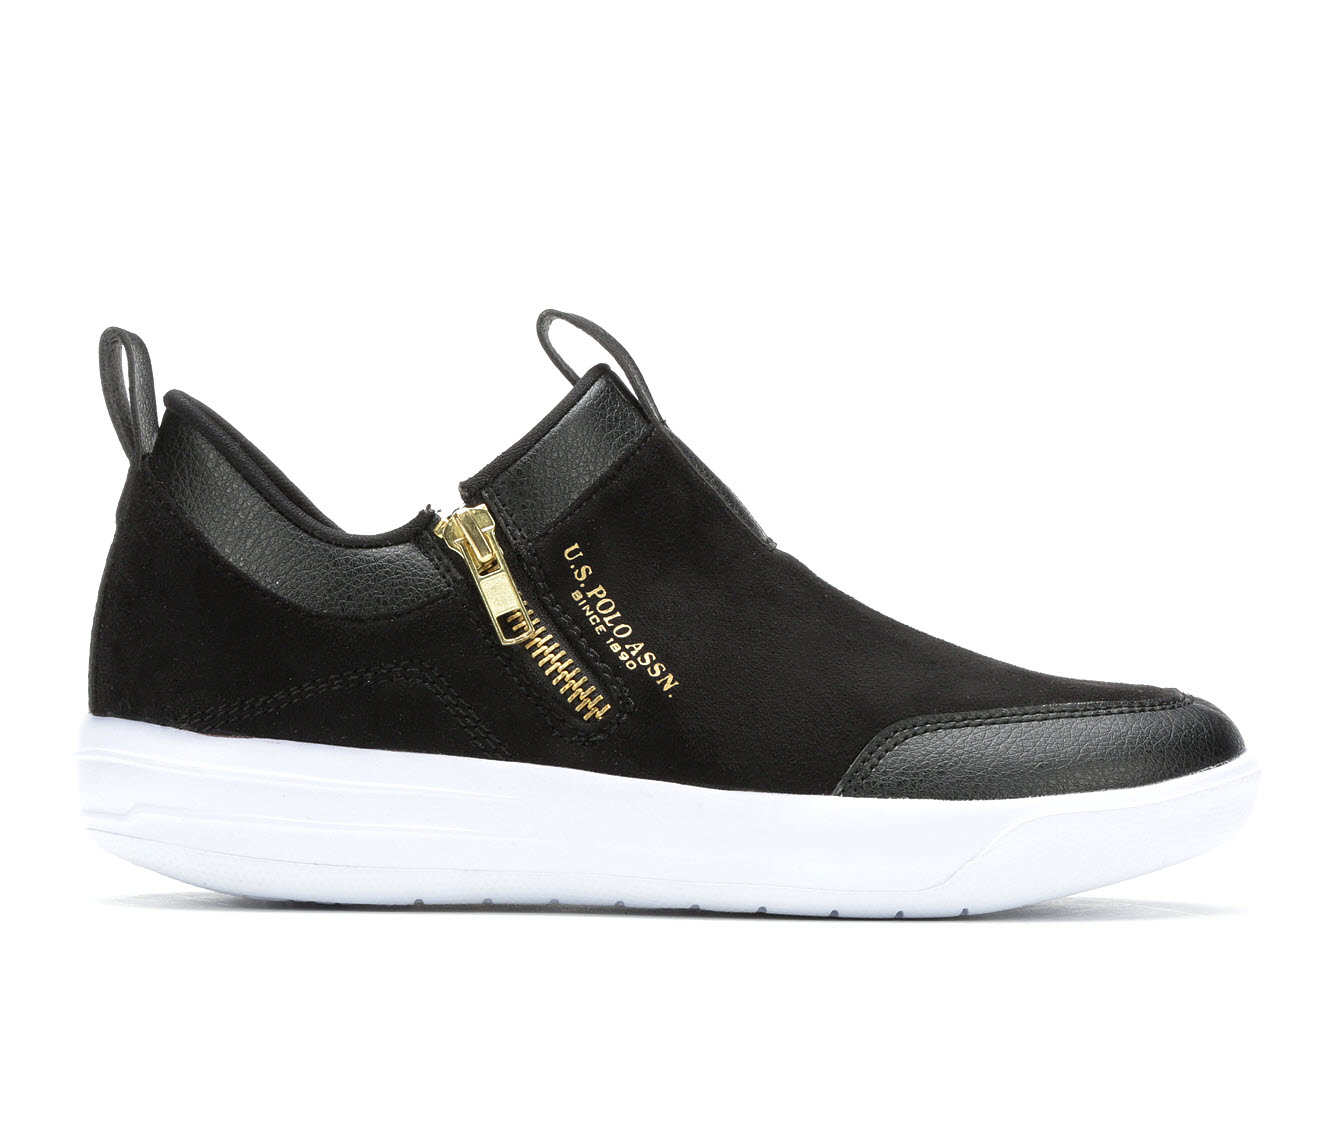 US Polo Assn Mega Women's Shoe (Black Faux Leather)